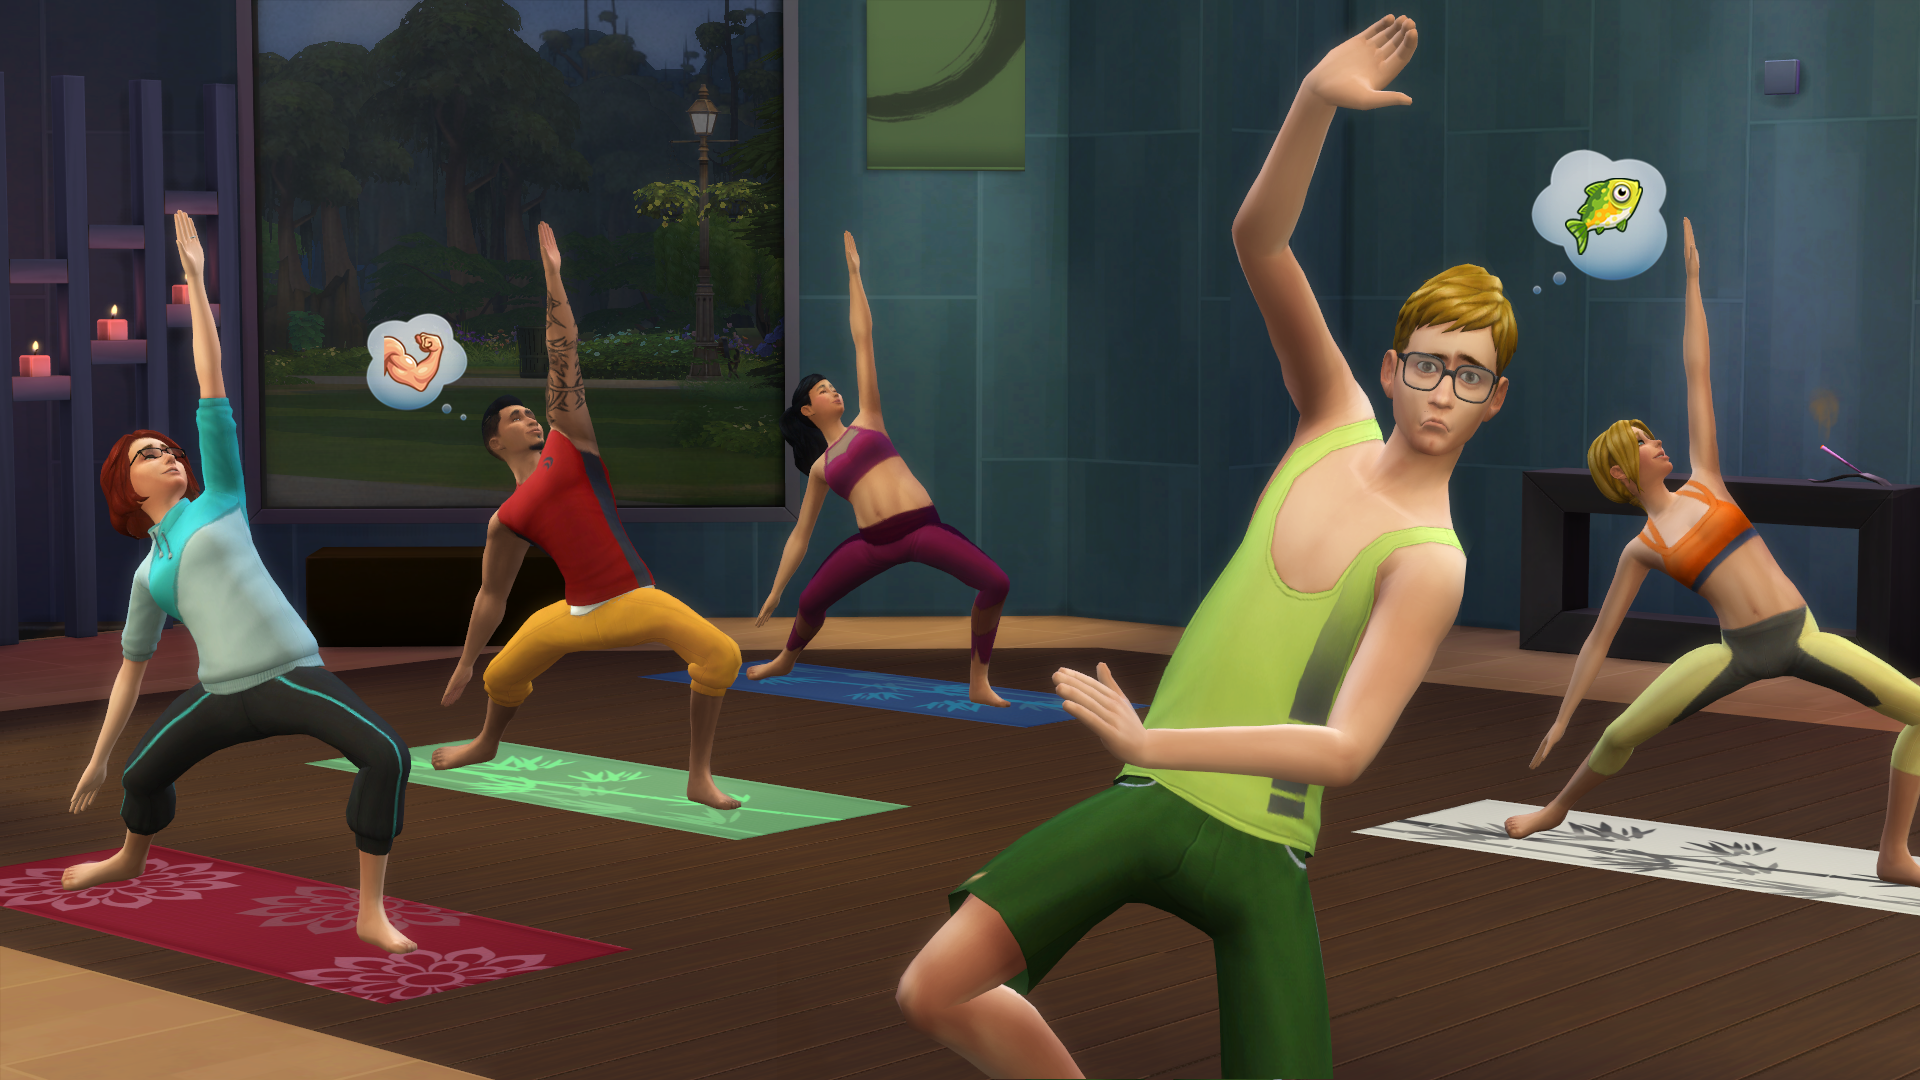 The Sims 4 День cпа